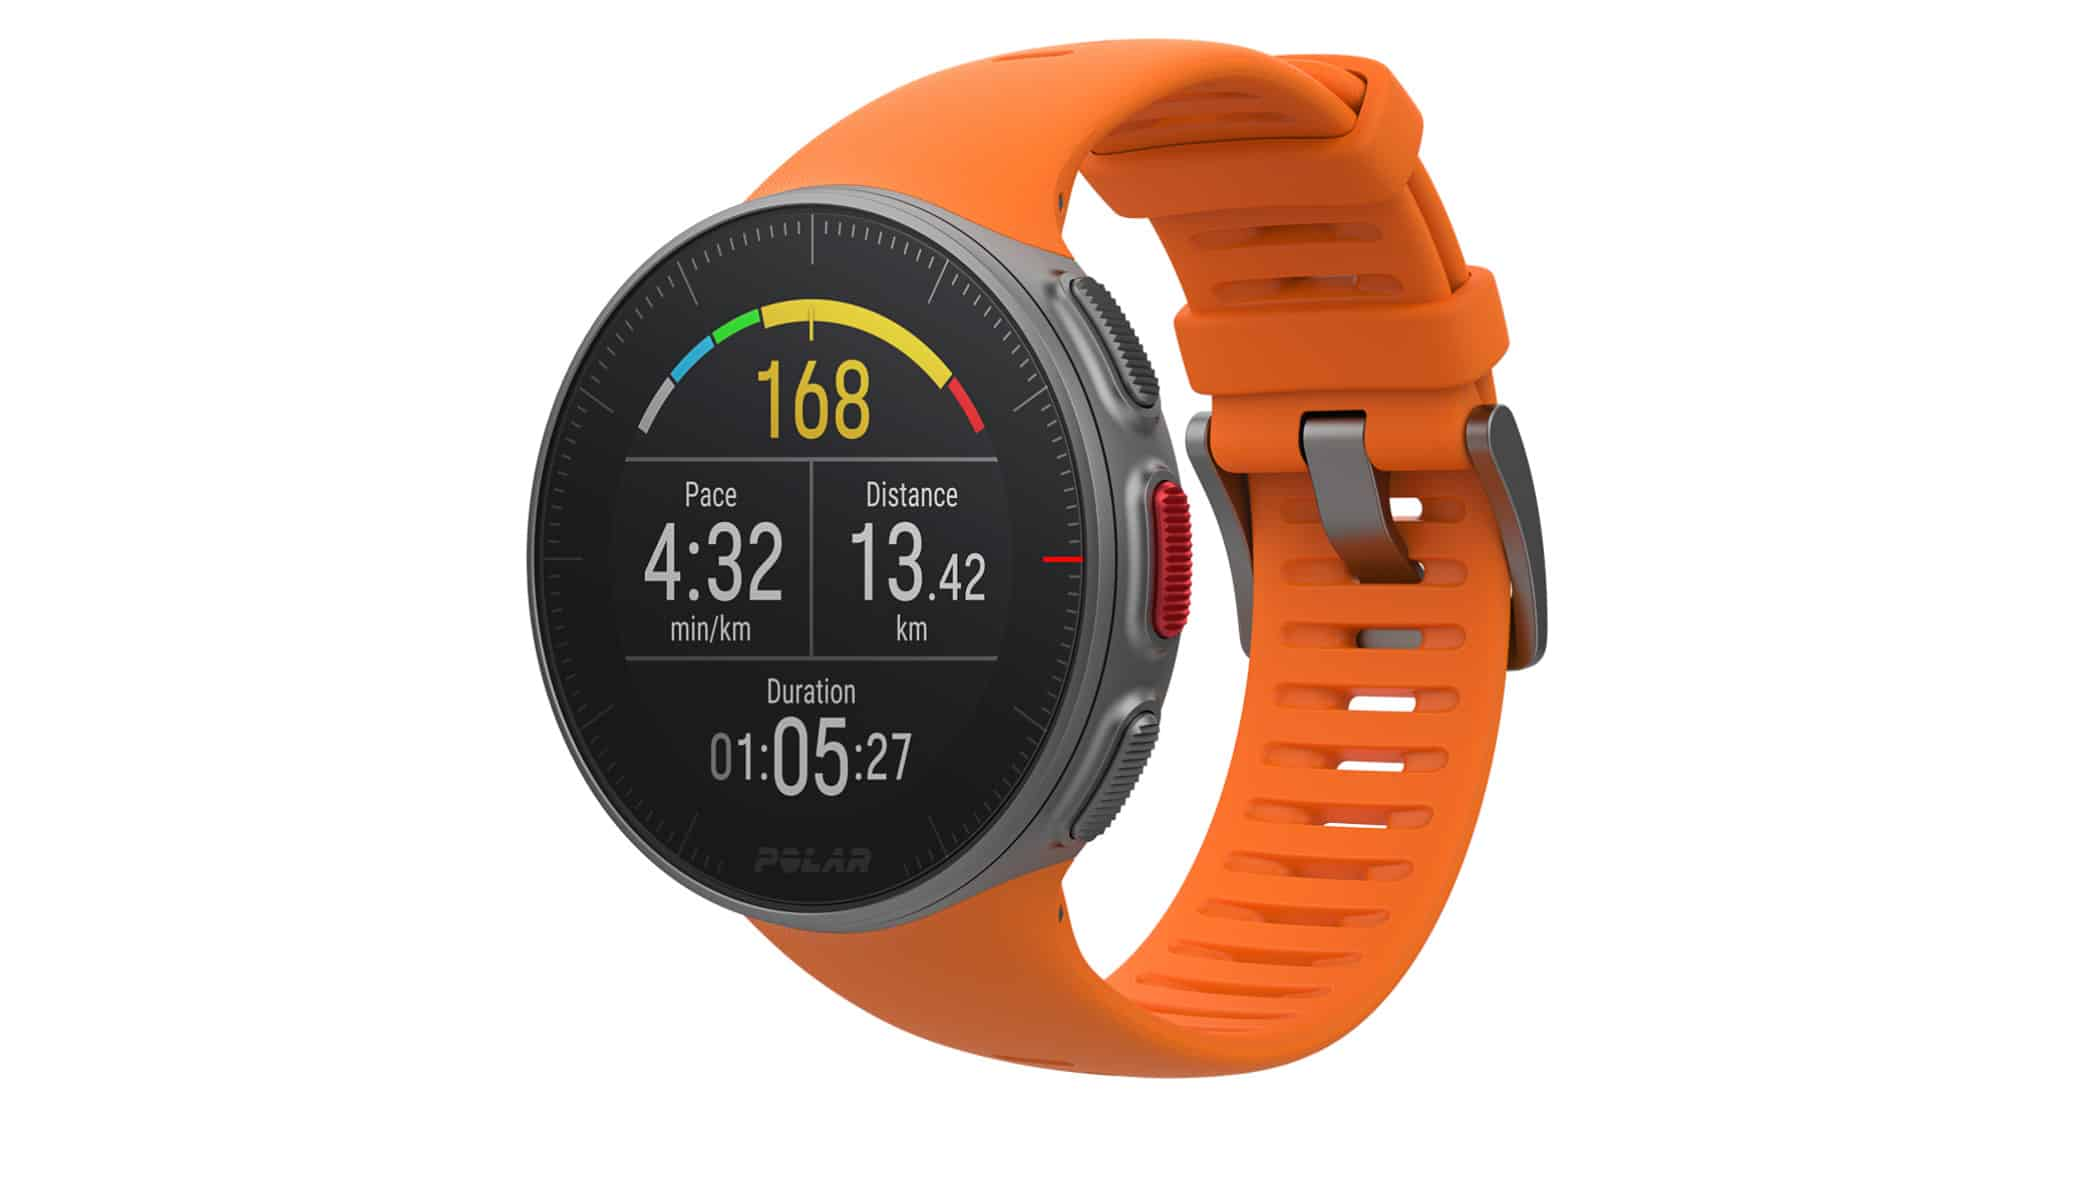 Polar Vantage V & M Smartwatches Promise Smarter Fitness ...